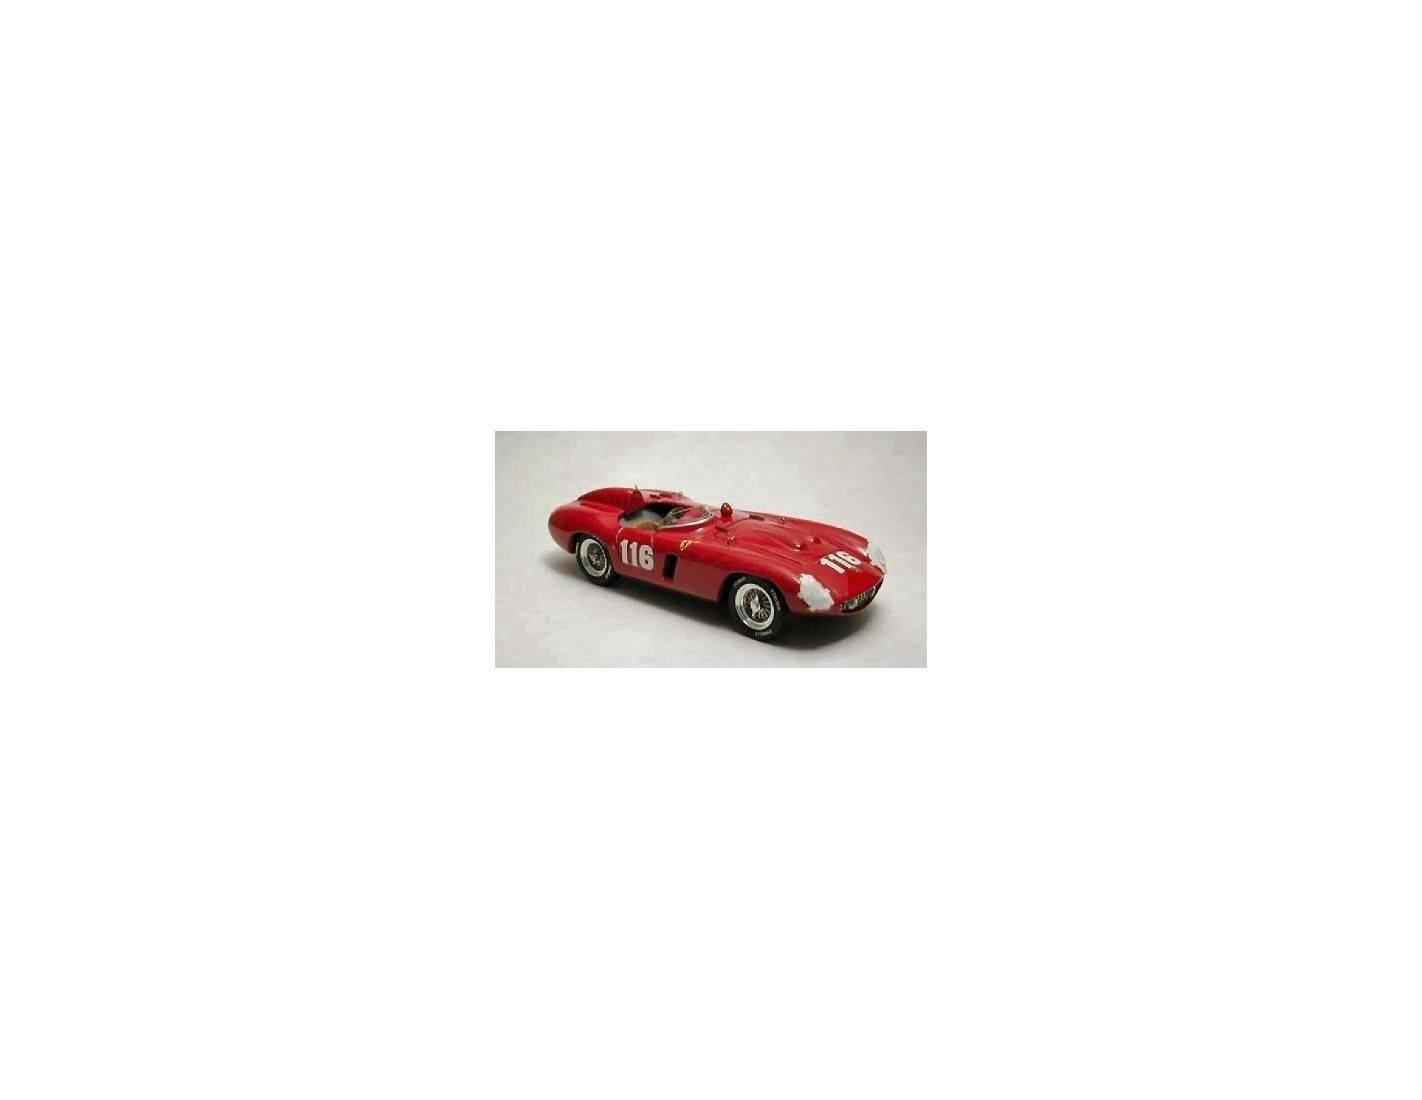 Art Model AM0160 FERRARI 857 MONZA N.116 3rd TARGA FLORIO 1955 CASTELLOTTI-MANZON 1:43 Modellino